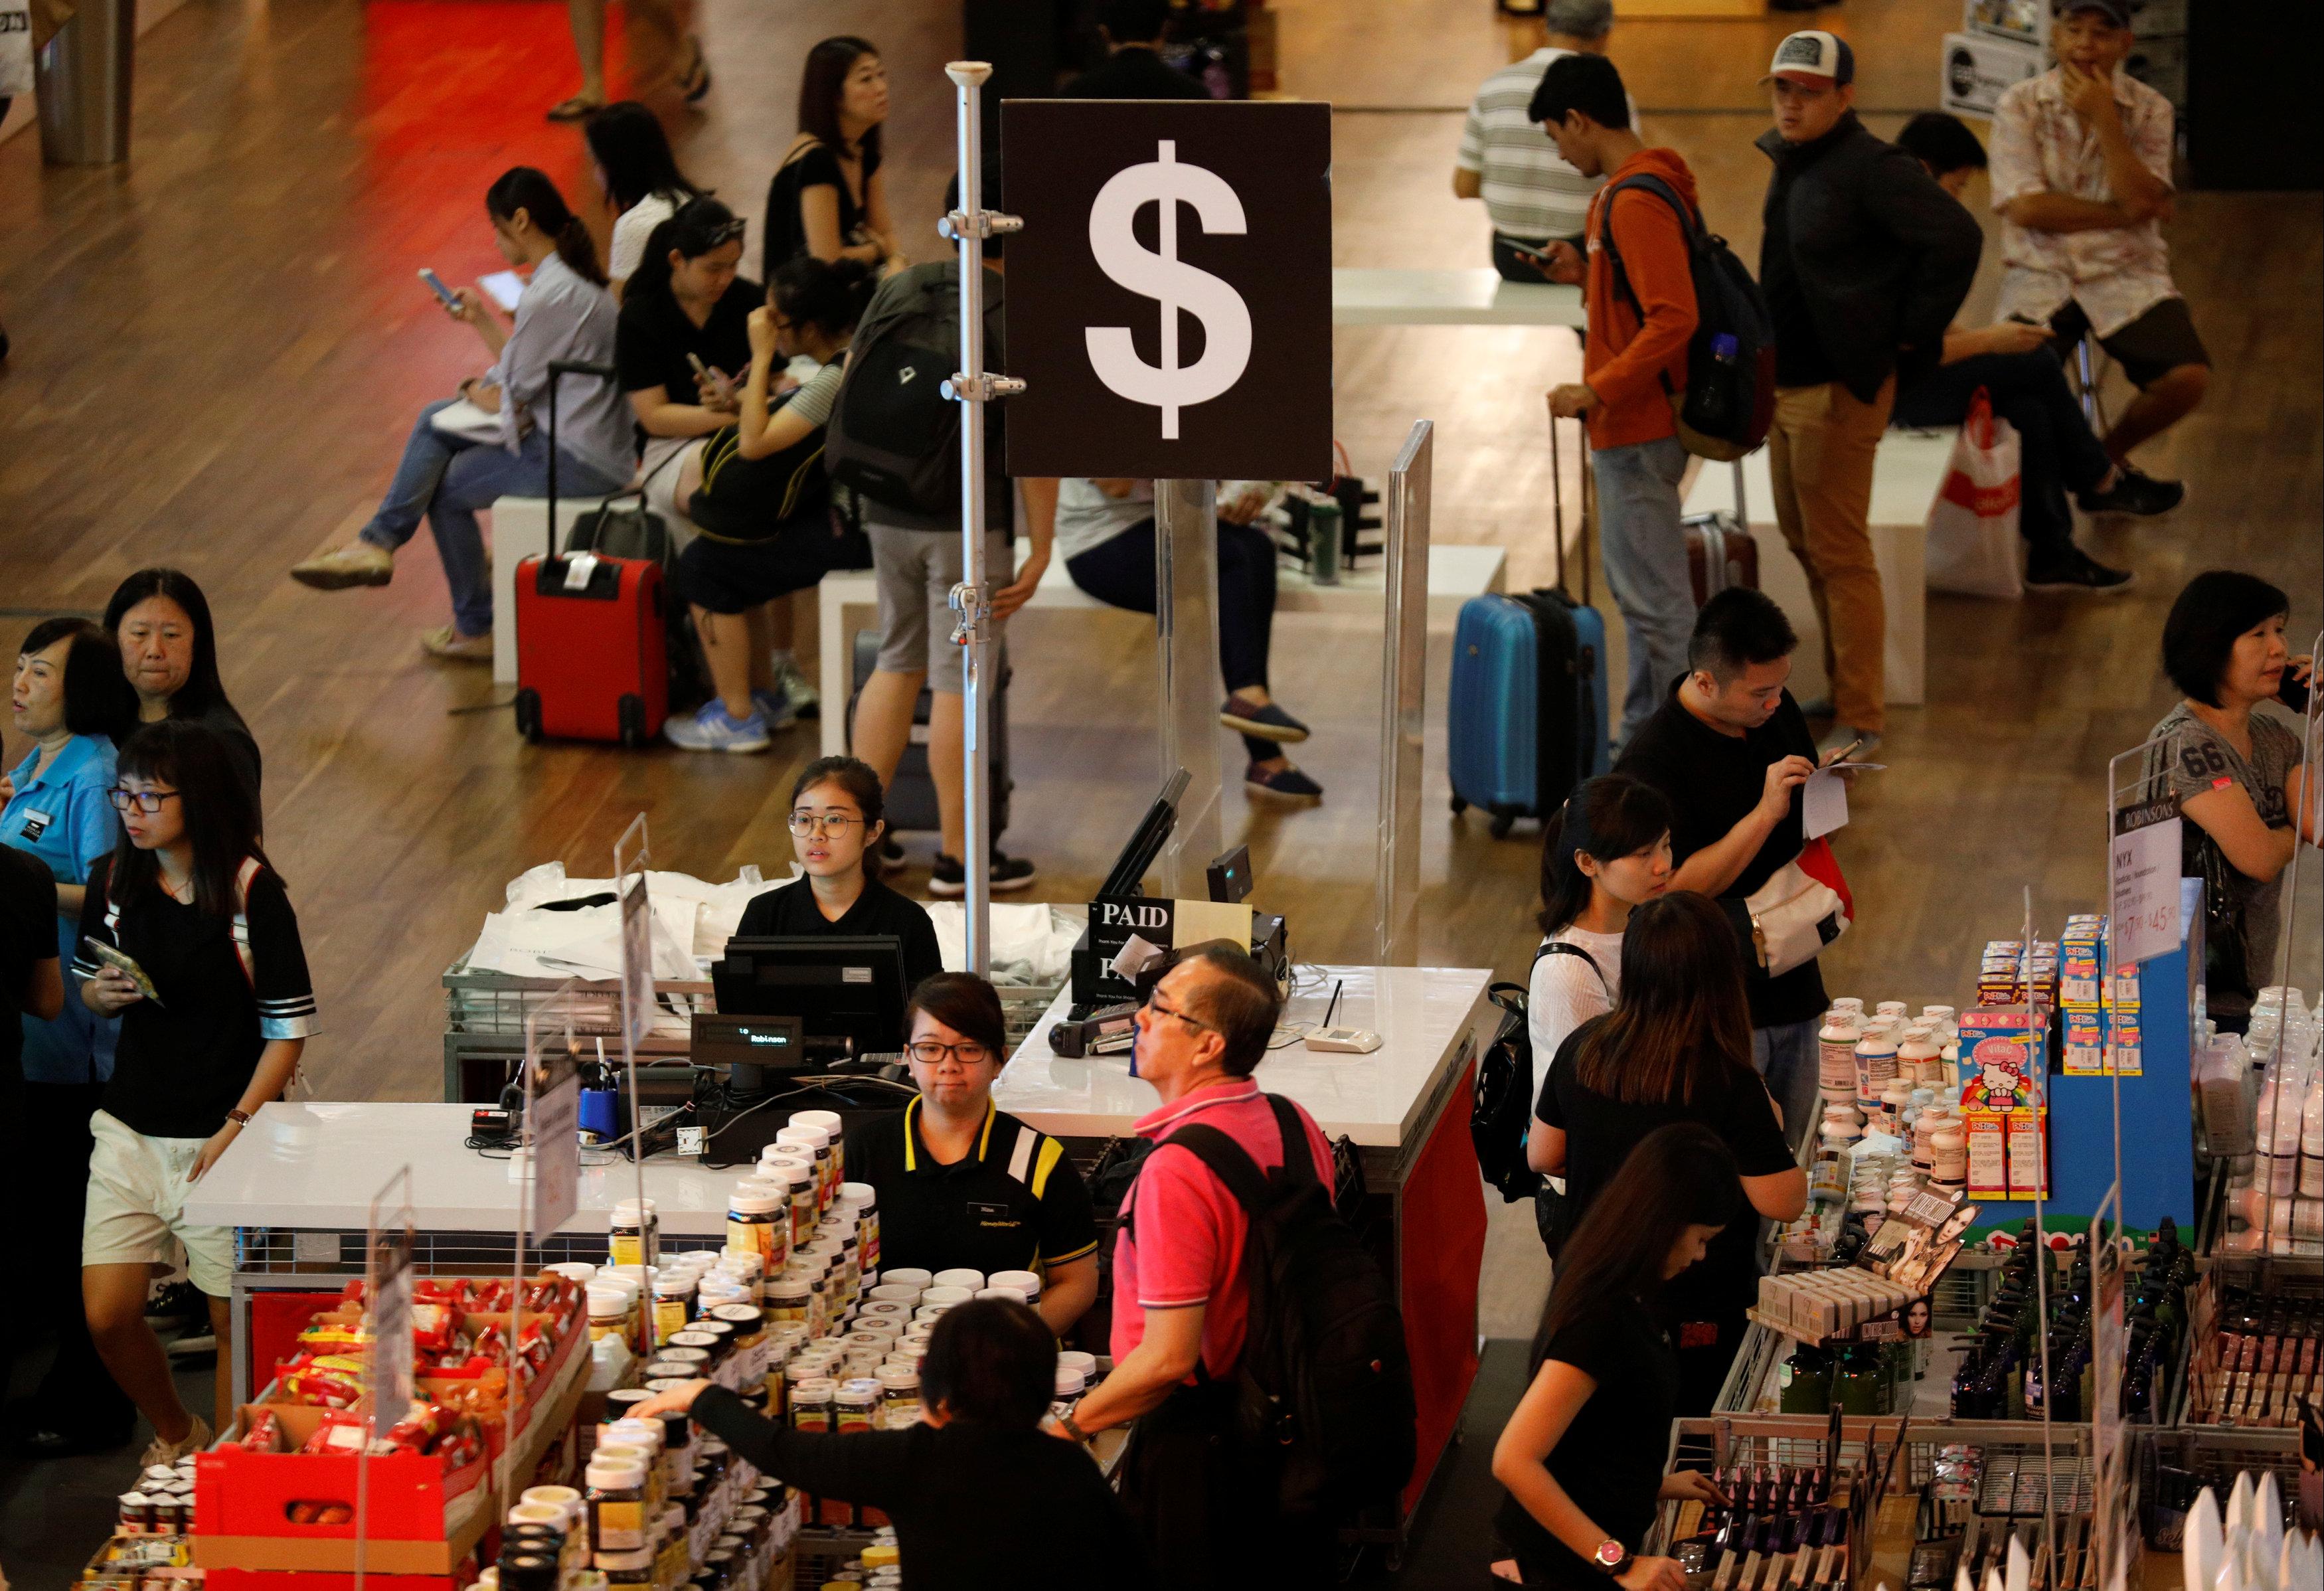 Singapore's economy grew 3.5 per cent in 2017